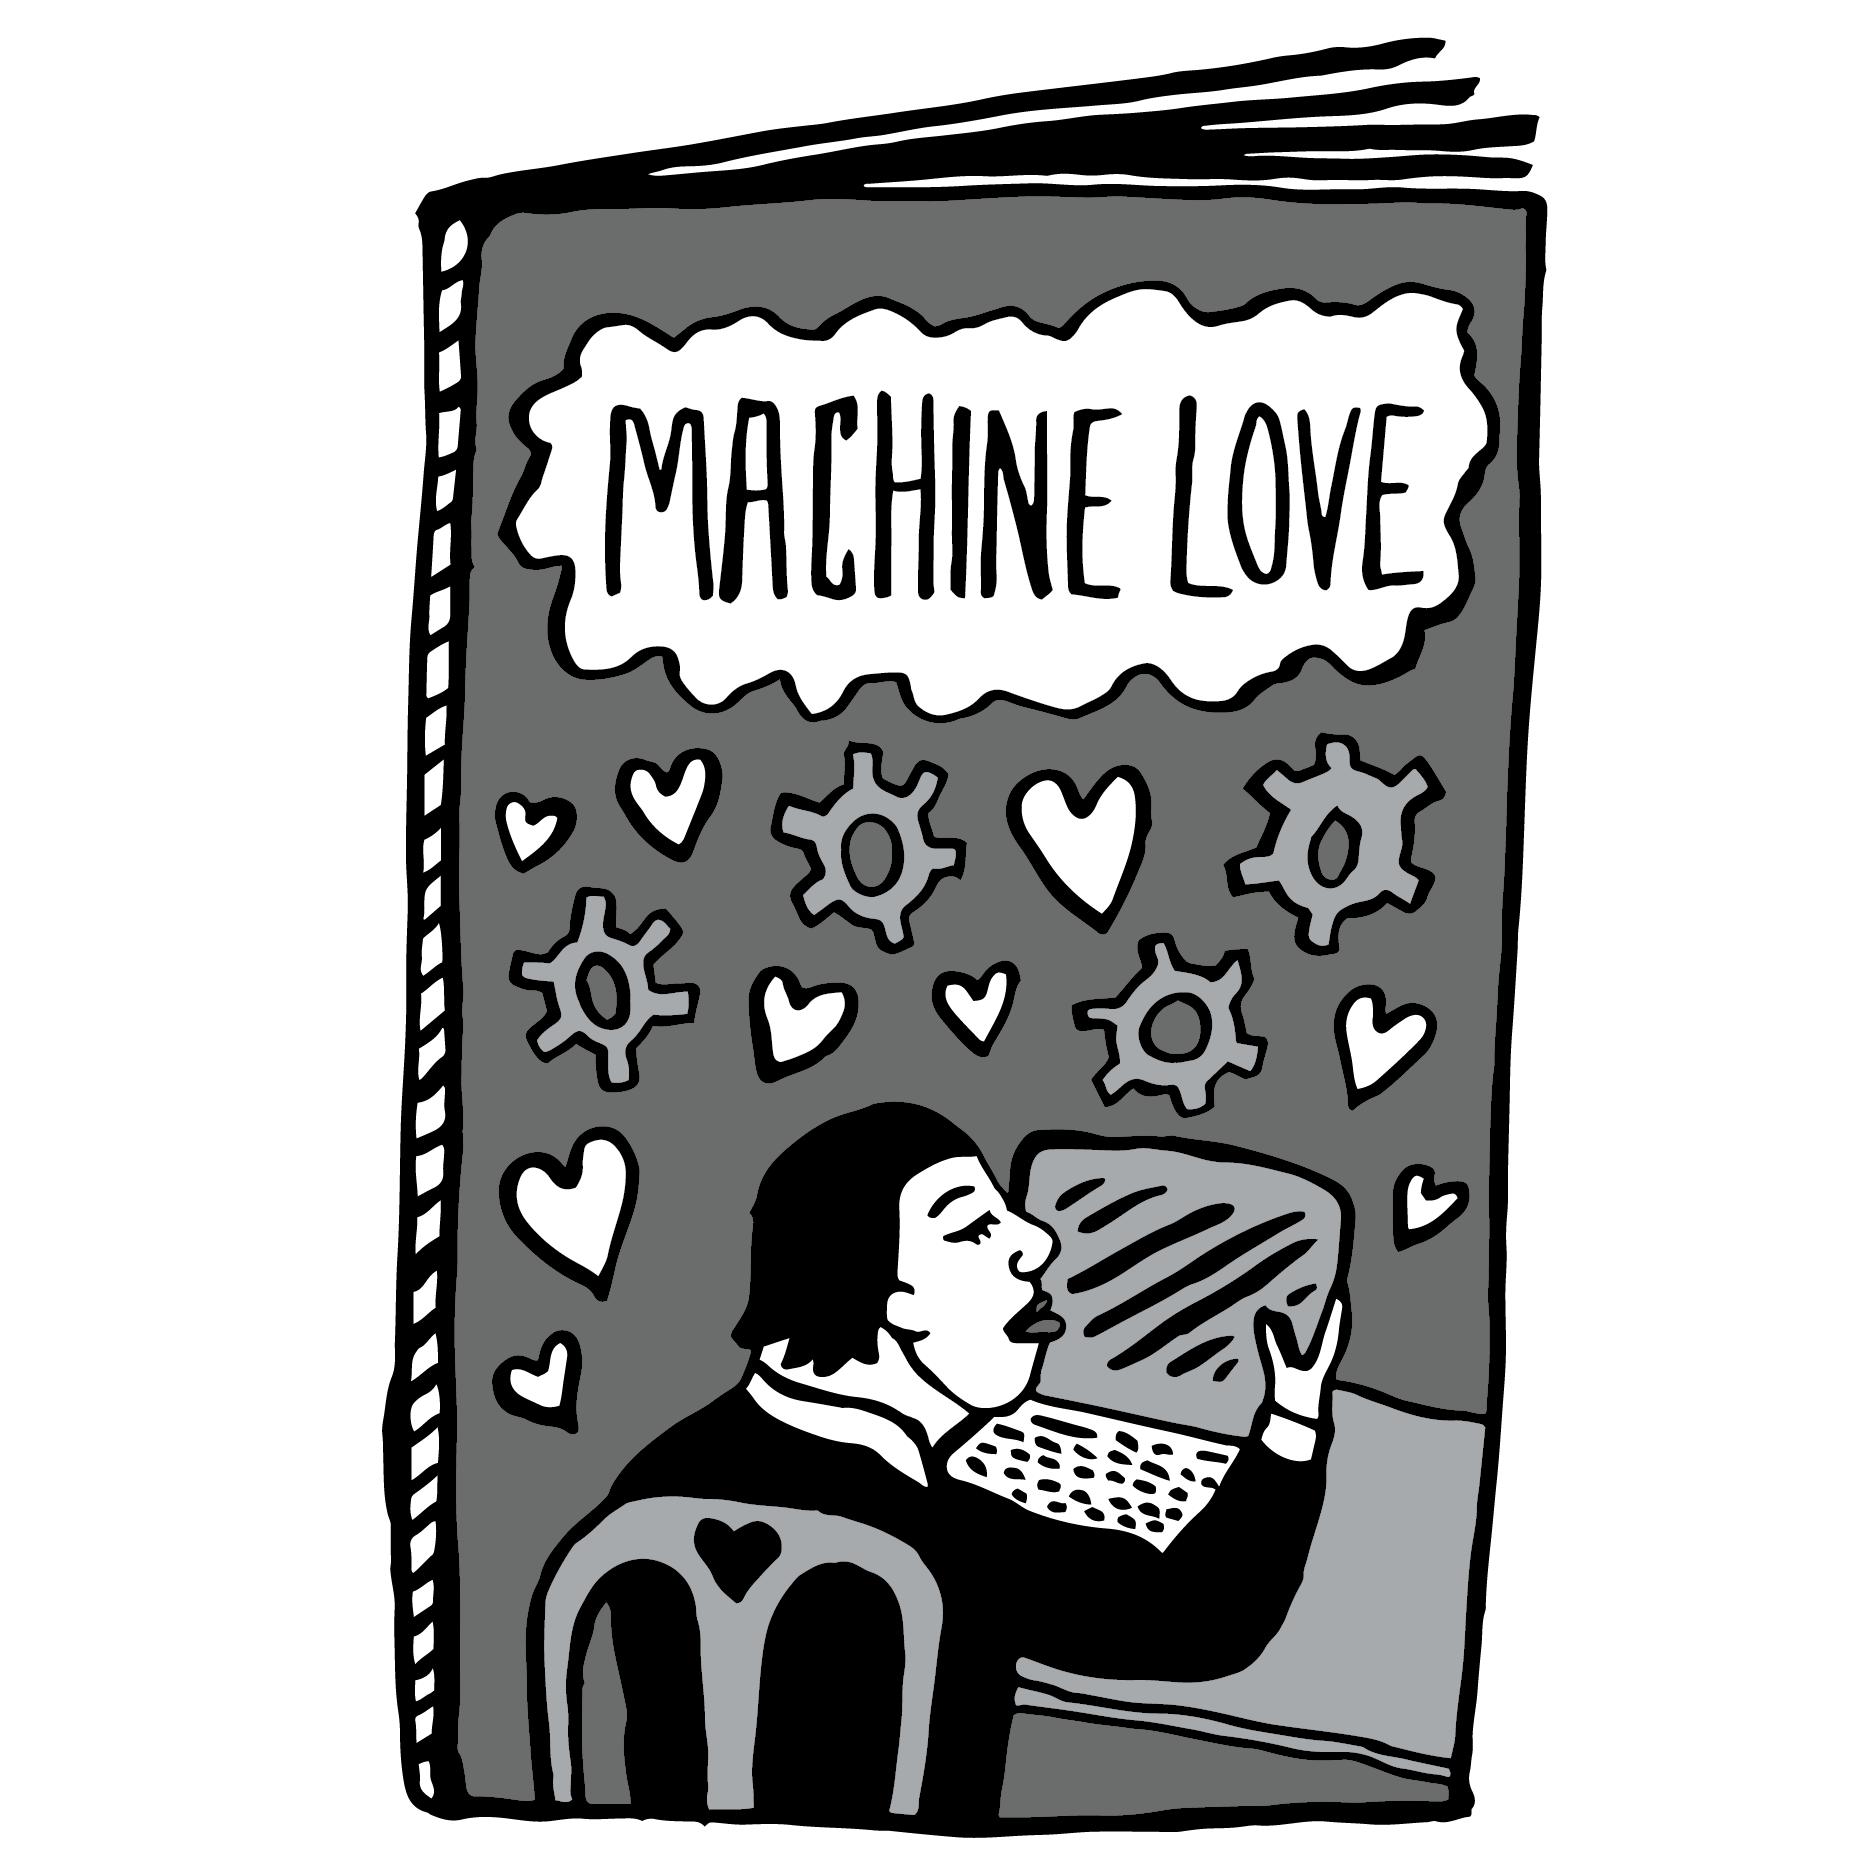 machinelove-02.png